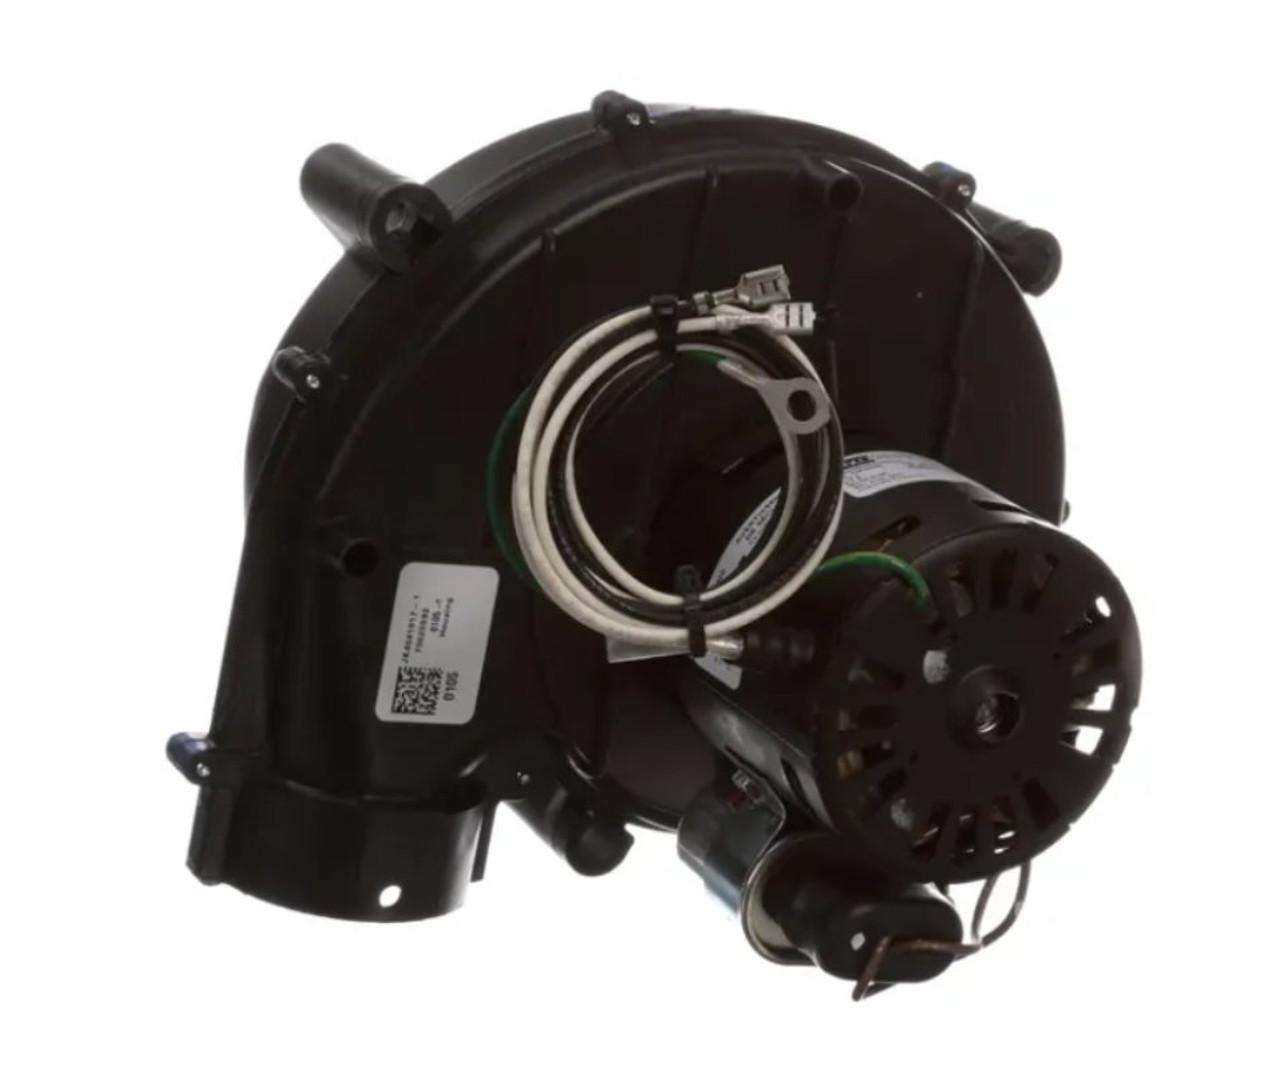 Rotom FB-RFB145 Blower Intercity Furnace Draft Inducer 7062-4061 7062-3793 115V